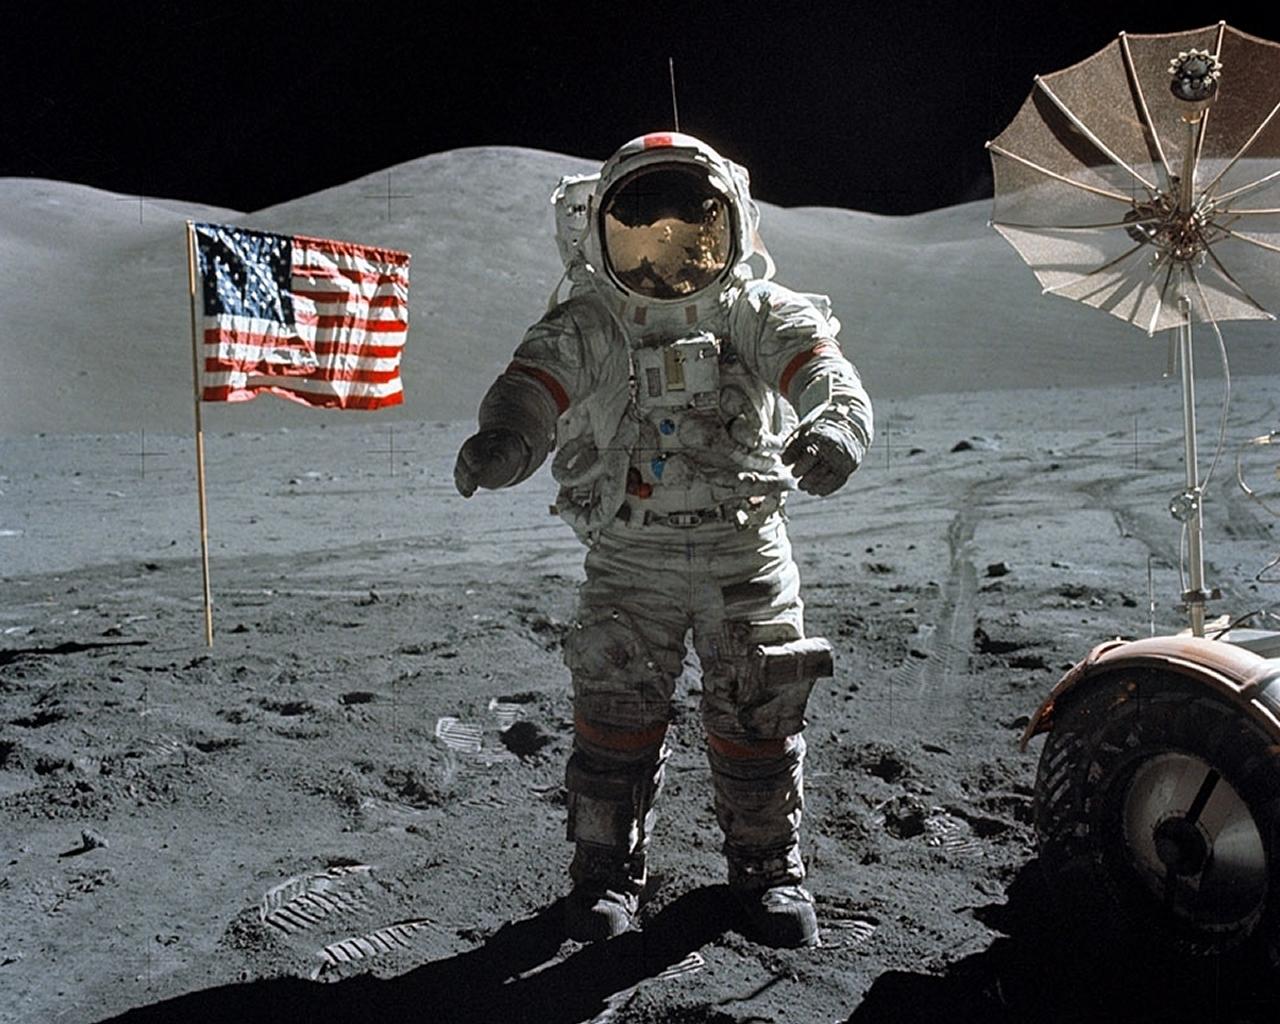 Last moonwalk Apollo 17